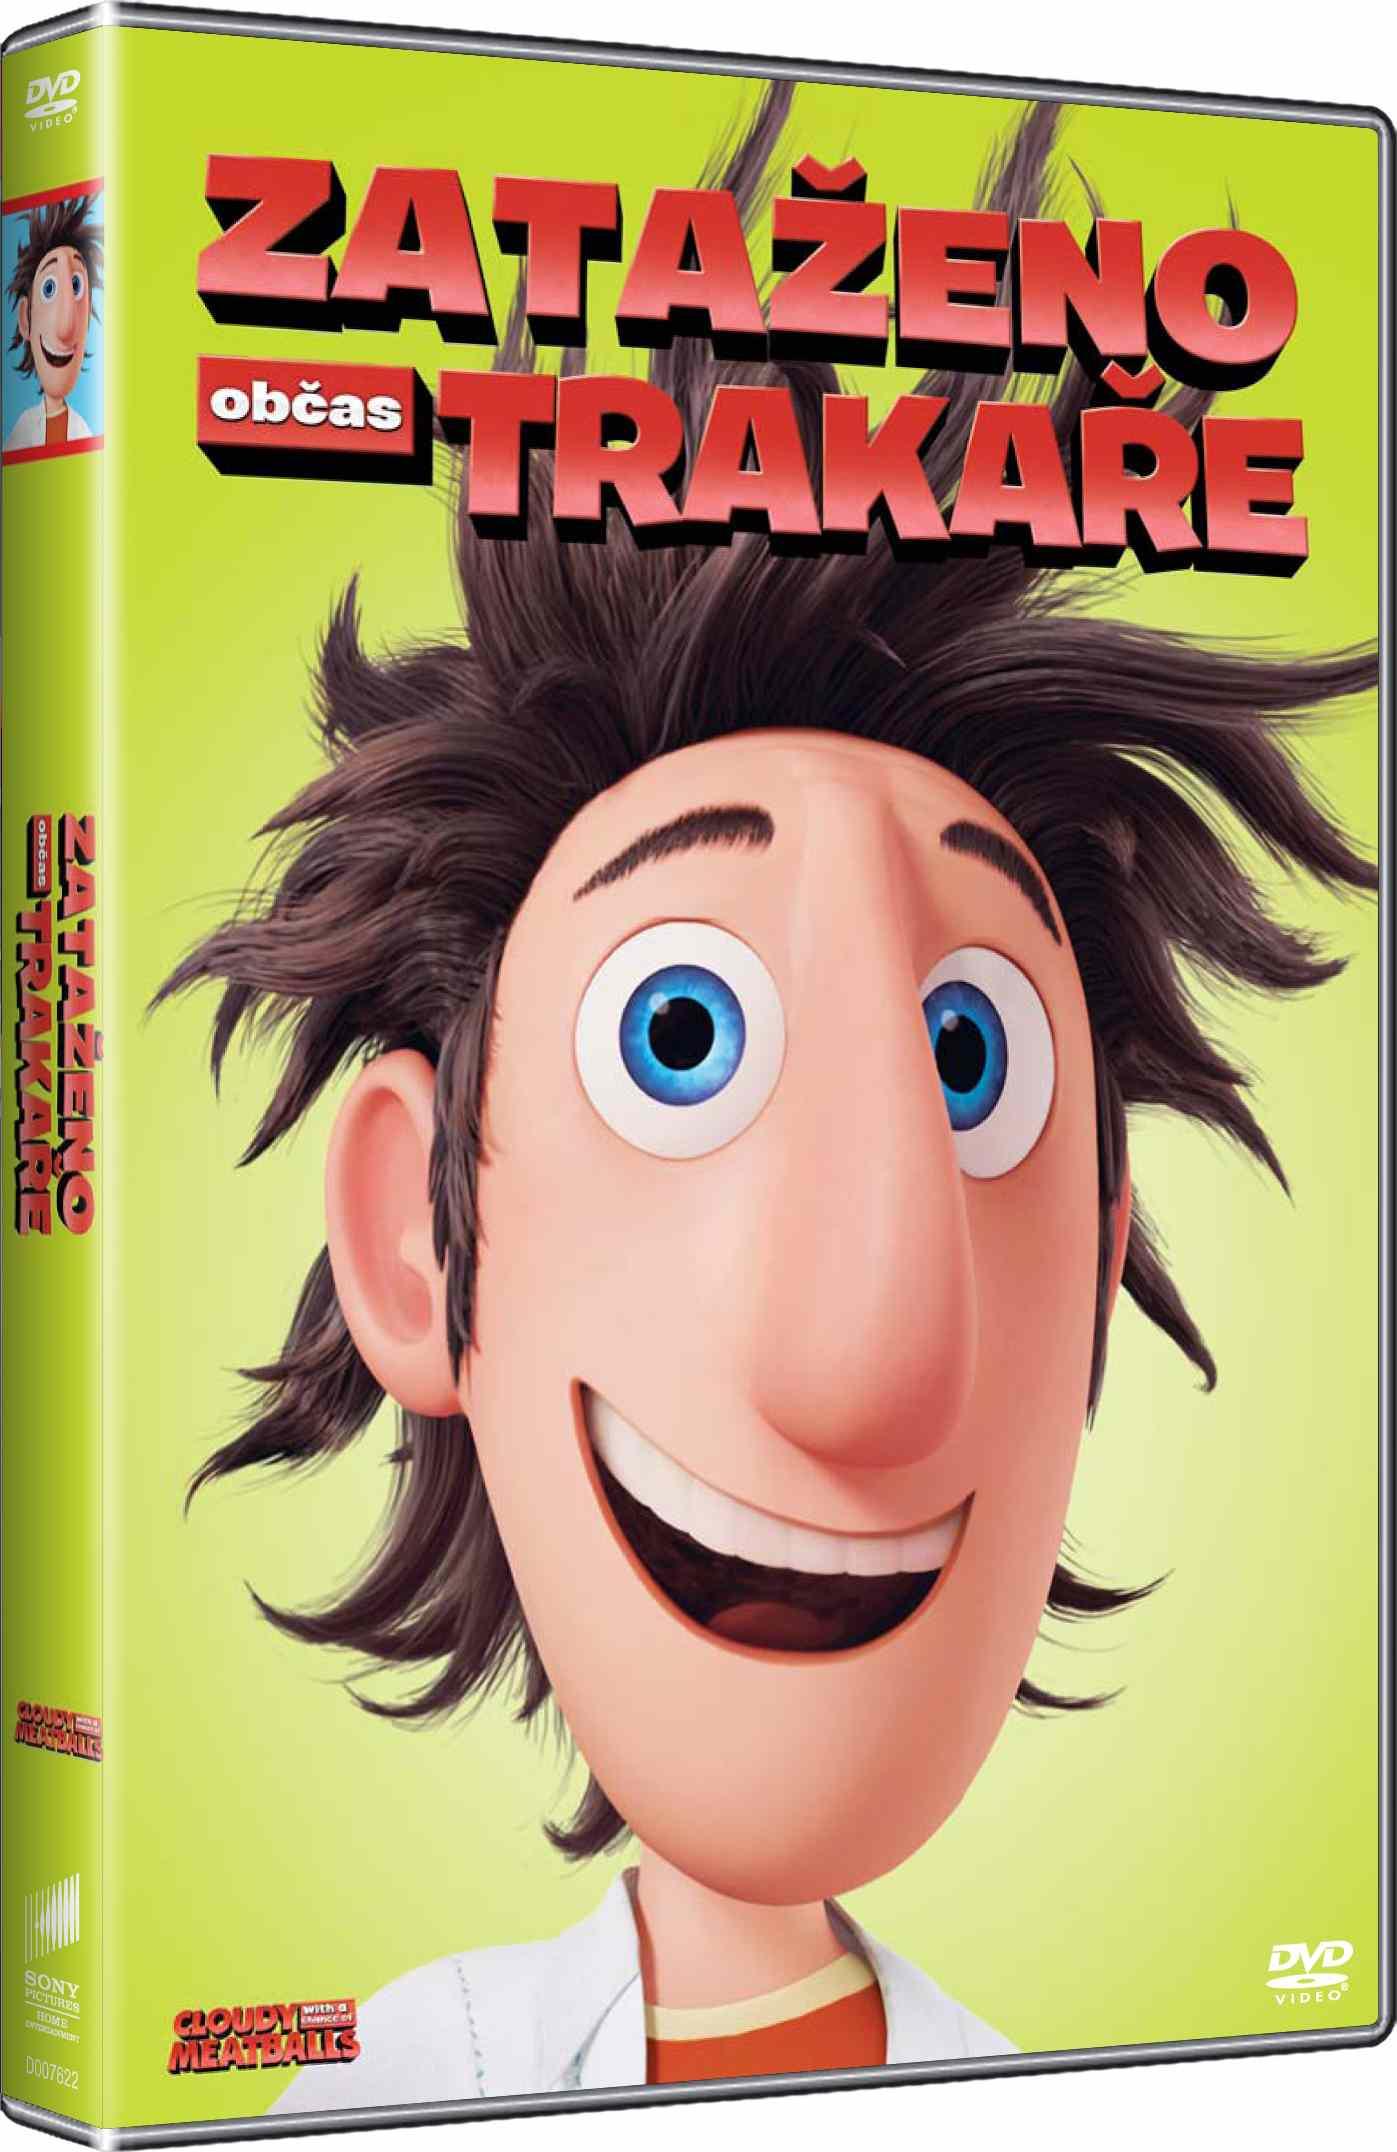 ZATAŽENO, OBČAS TRAKAŘE (Big Face) - DVD